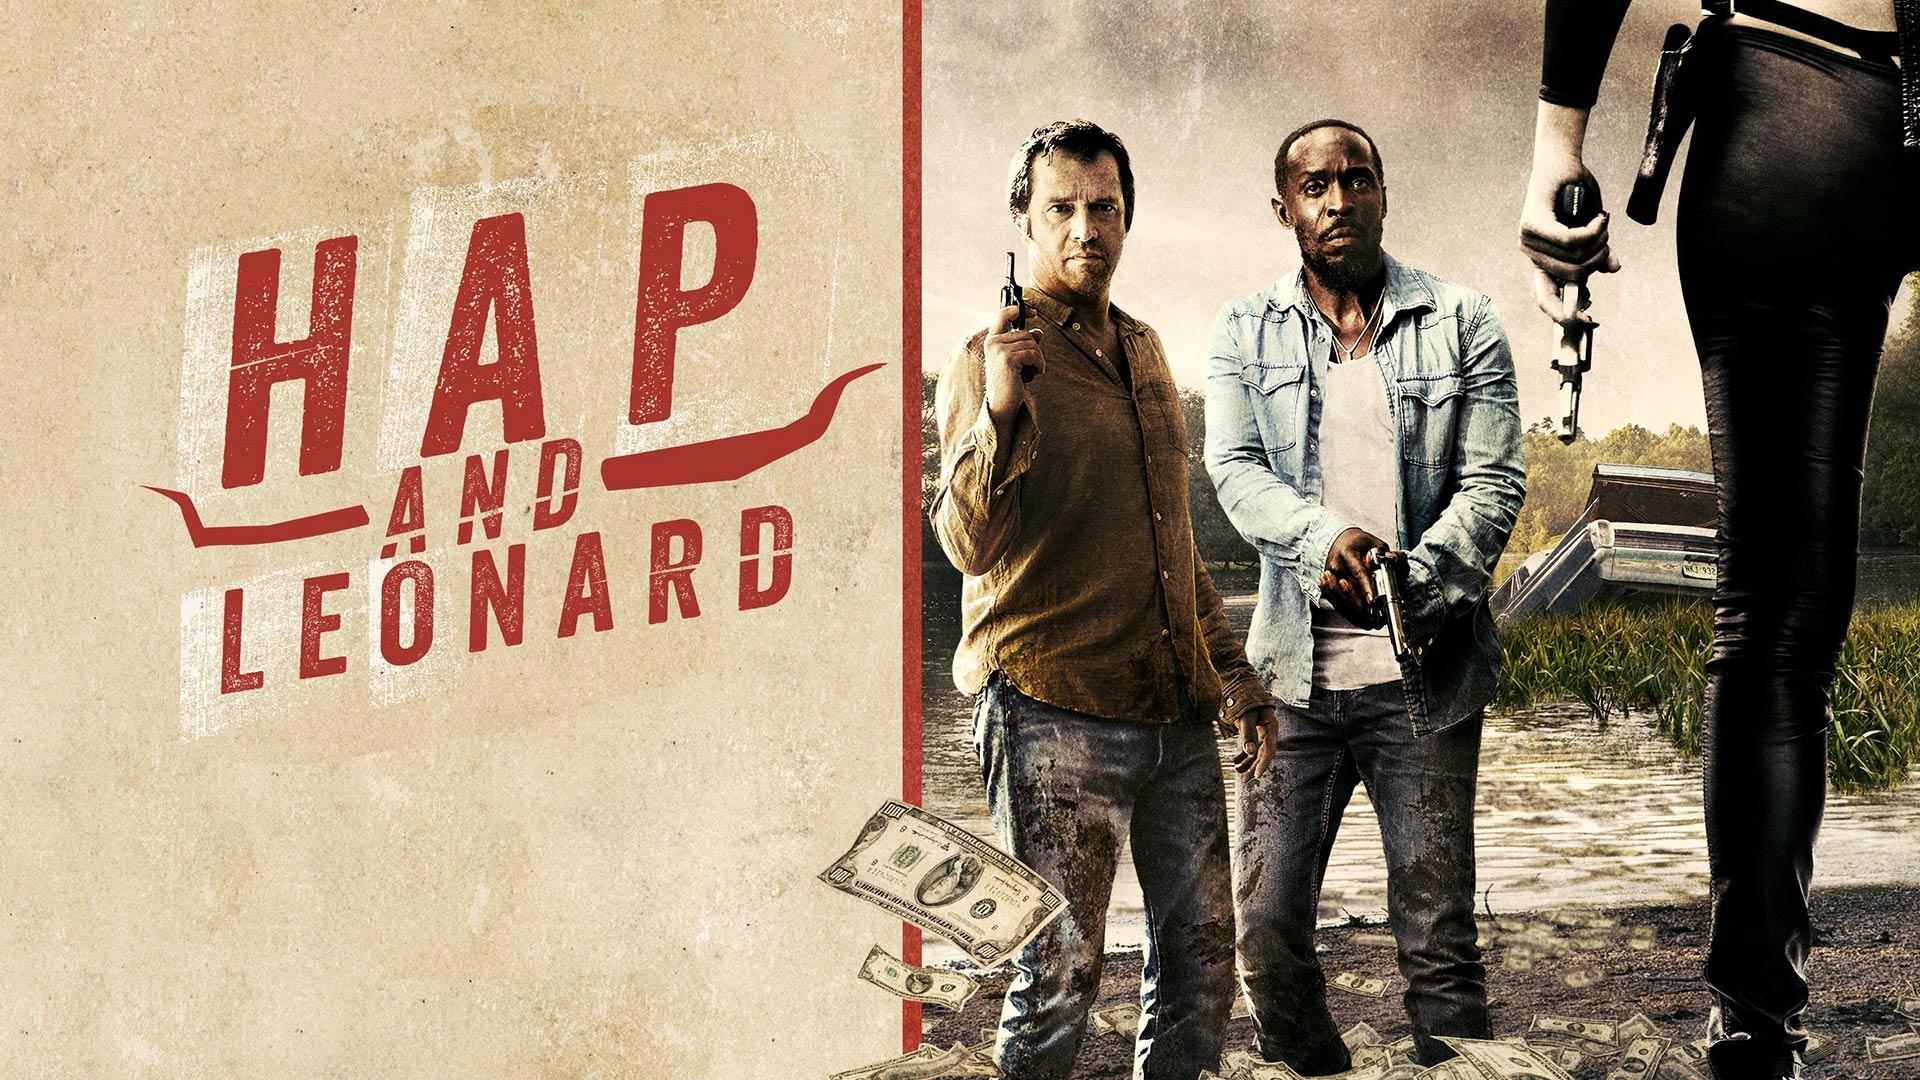 Hap and Leonard, Season 1